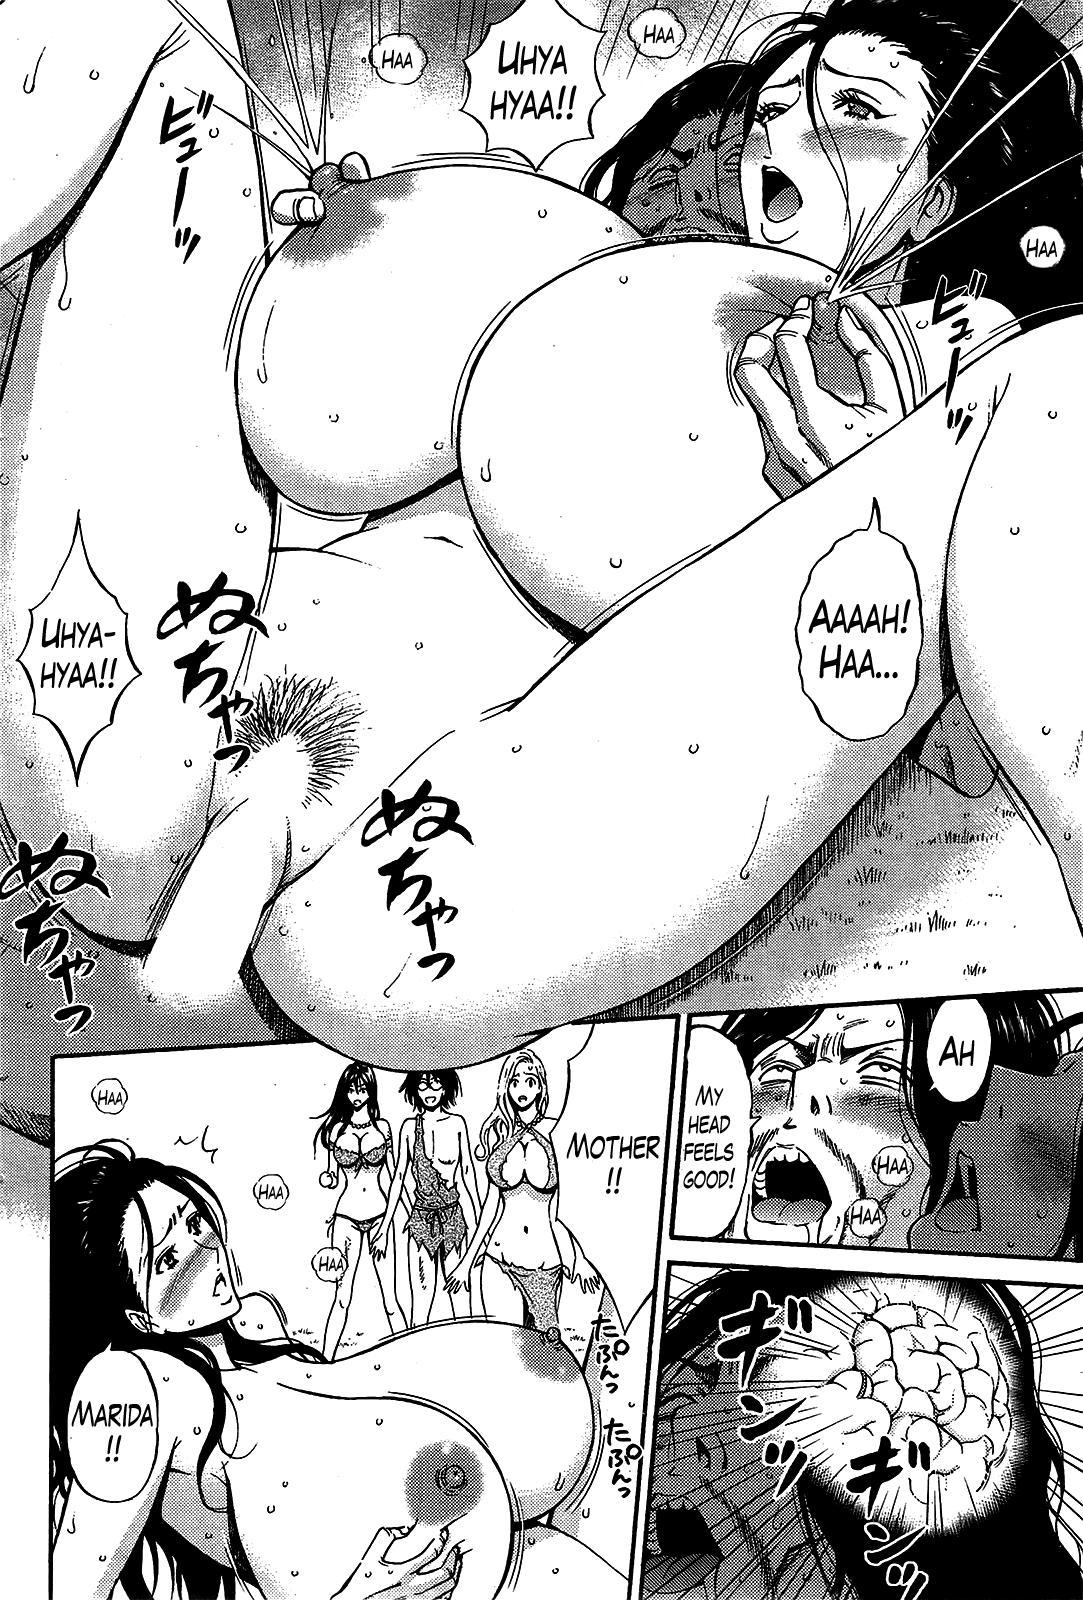 Kigenzen 10000 Nen no Ota | The Otaku in 10,000 B.C. 267